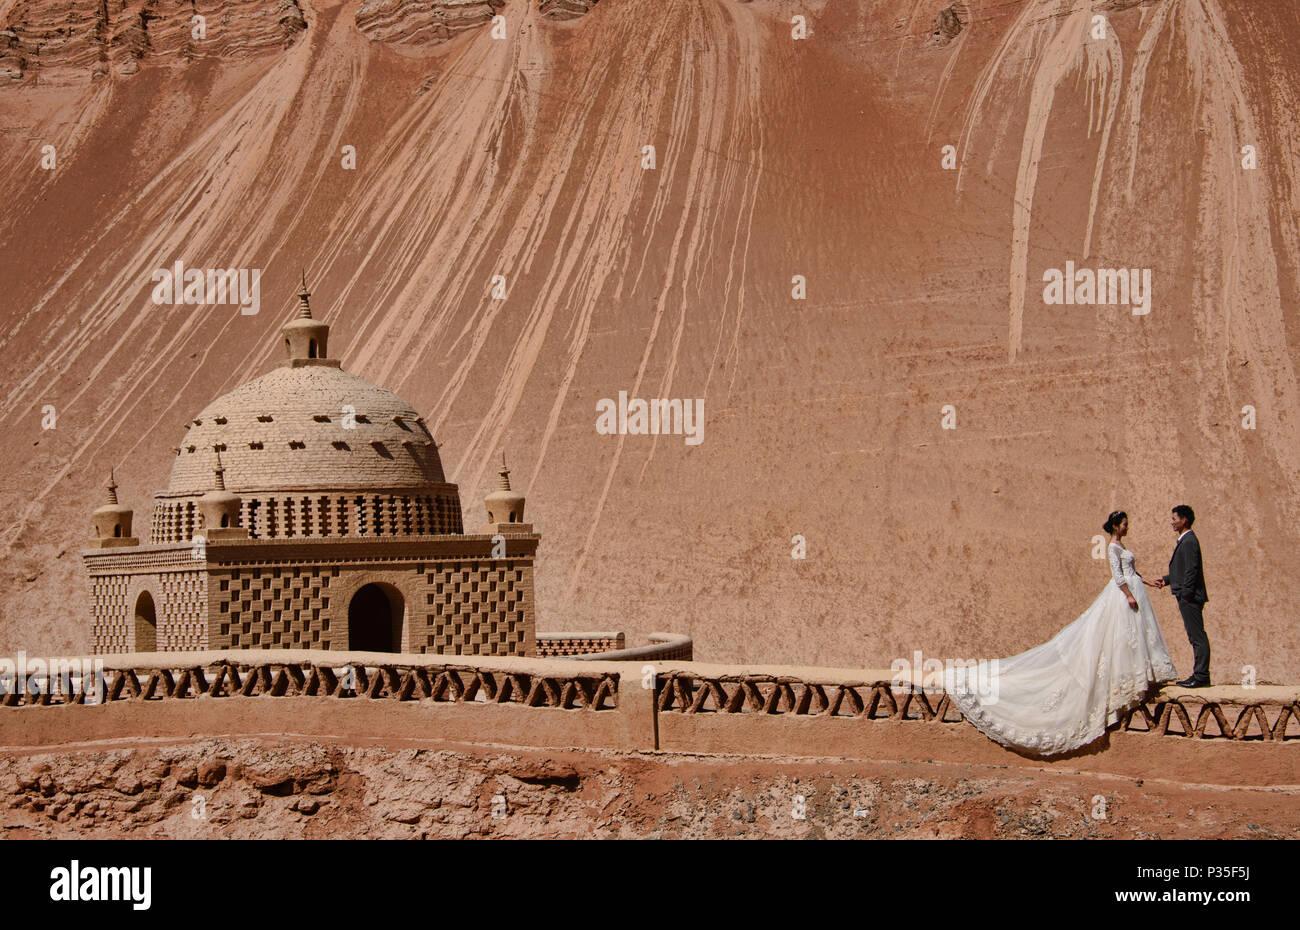 Uyghur tomb in the Flaming Mountains, Turpan, Xinjiang, China - Stock Image